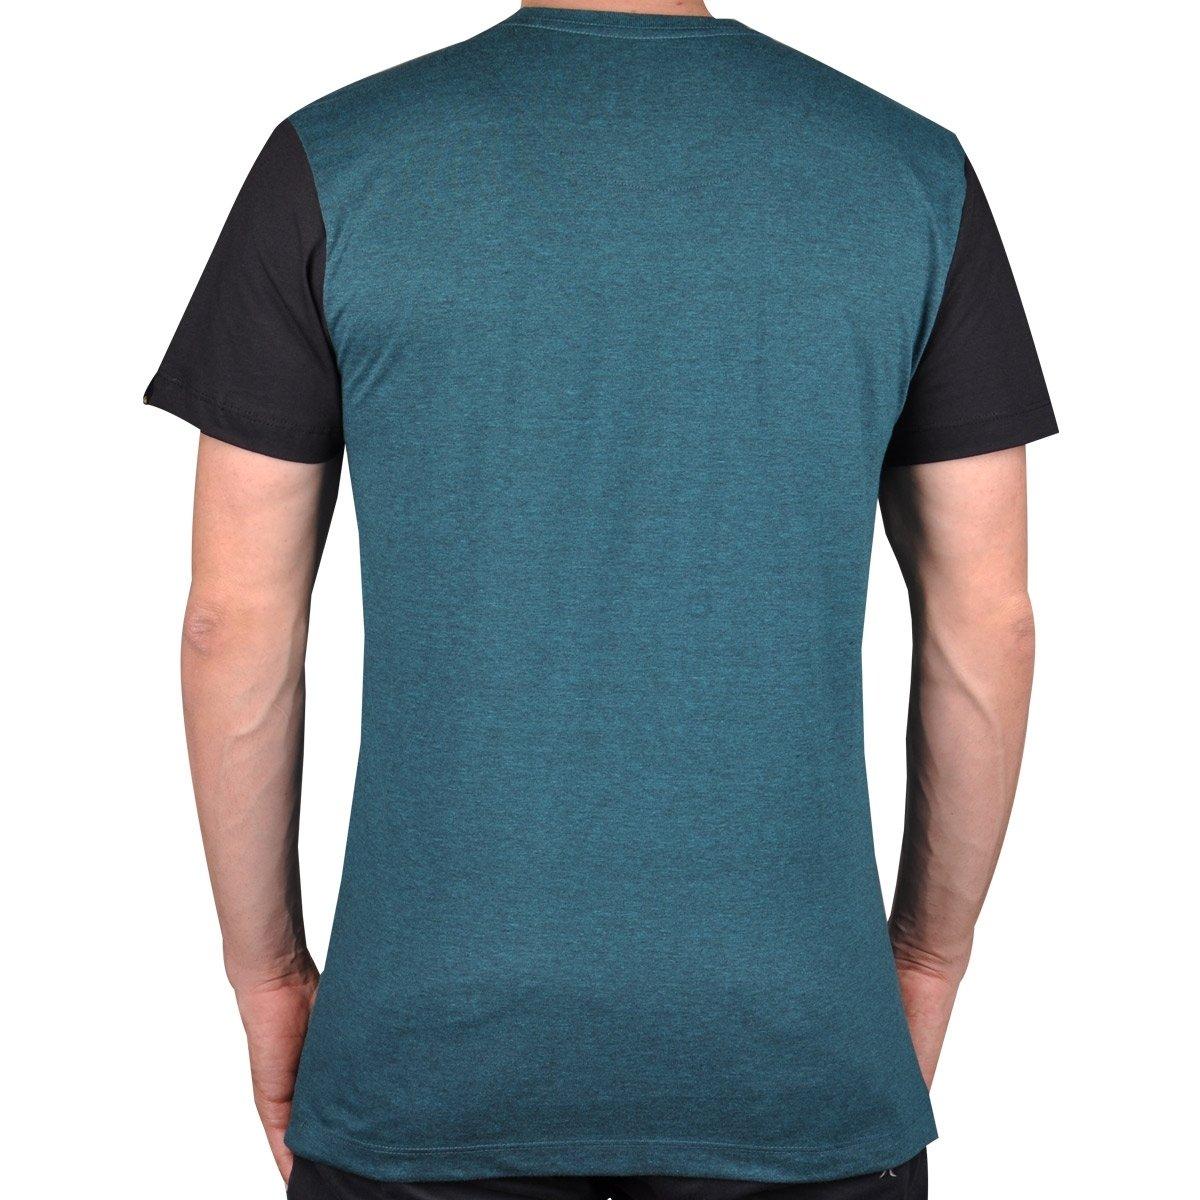 Camiseta Quiksilver Quiksilver Card Card Camiseta Quiksilver Verde Camiseta Card Verde 1Yxq77